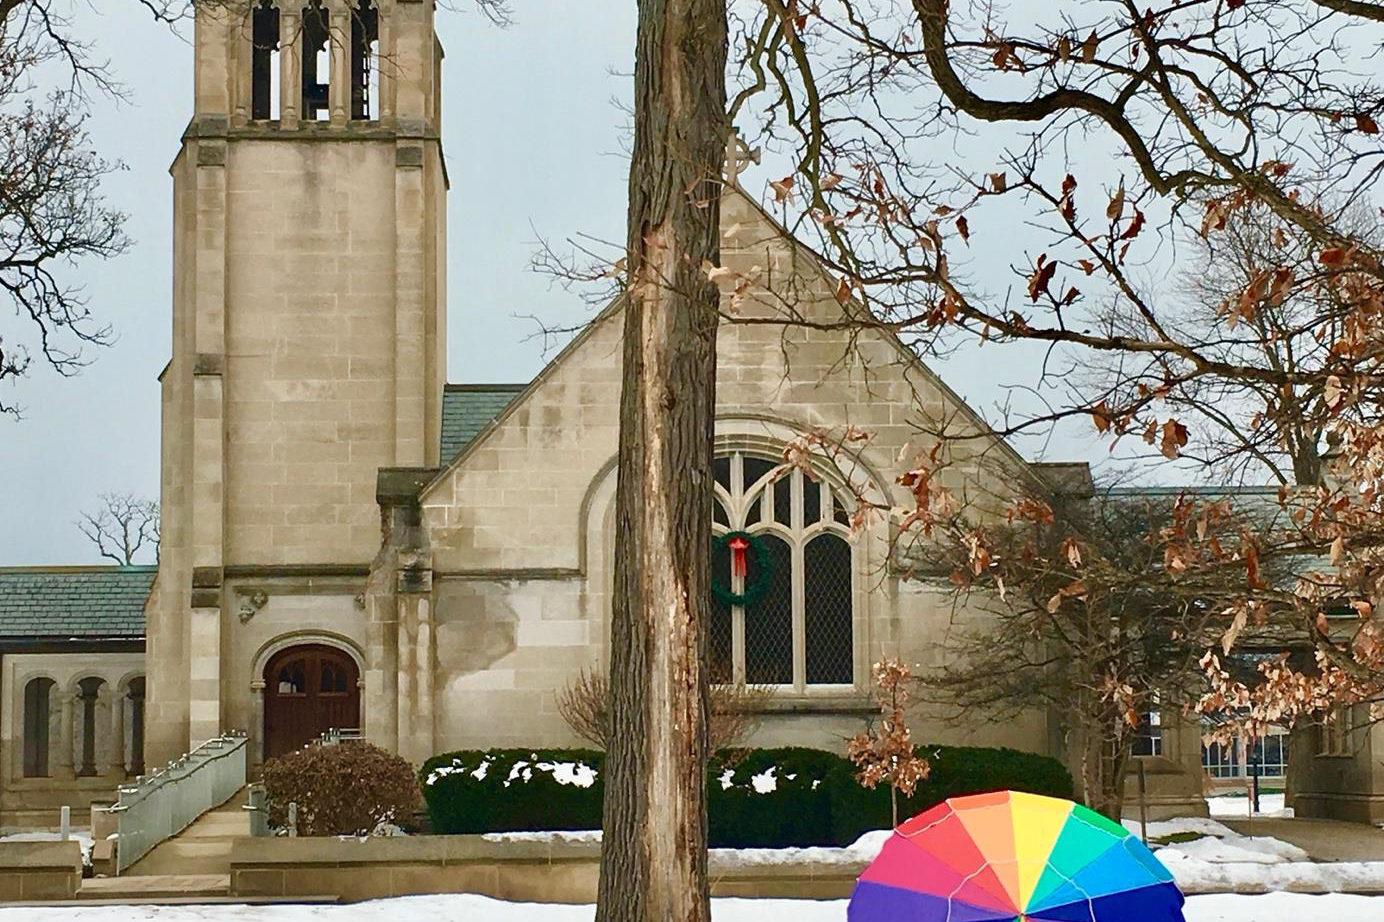 Lily Reid Holt Chapel in the Wintertime